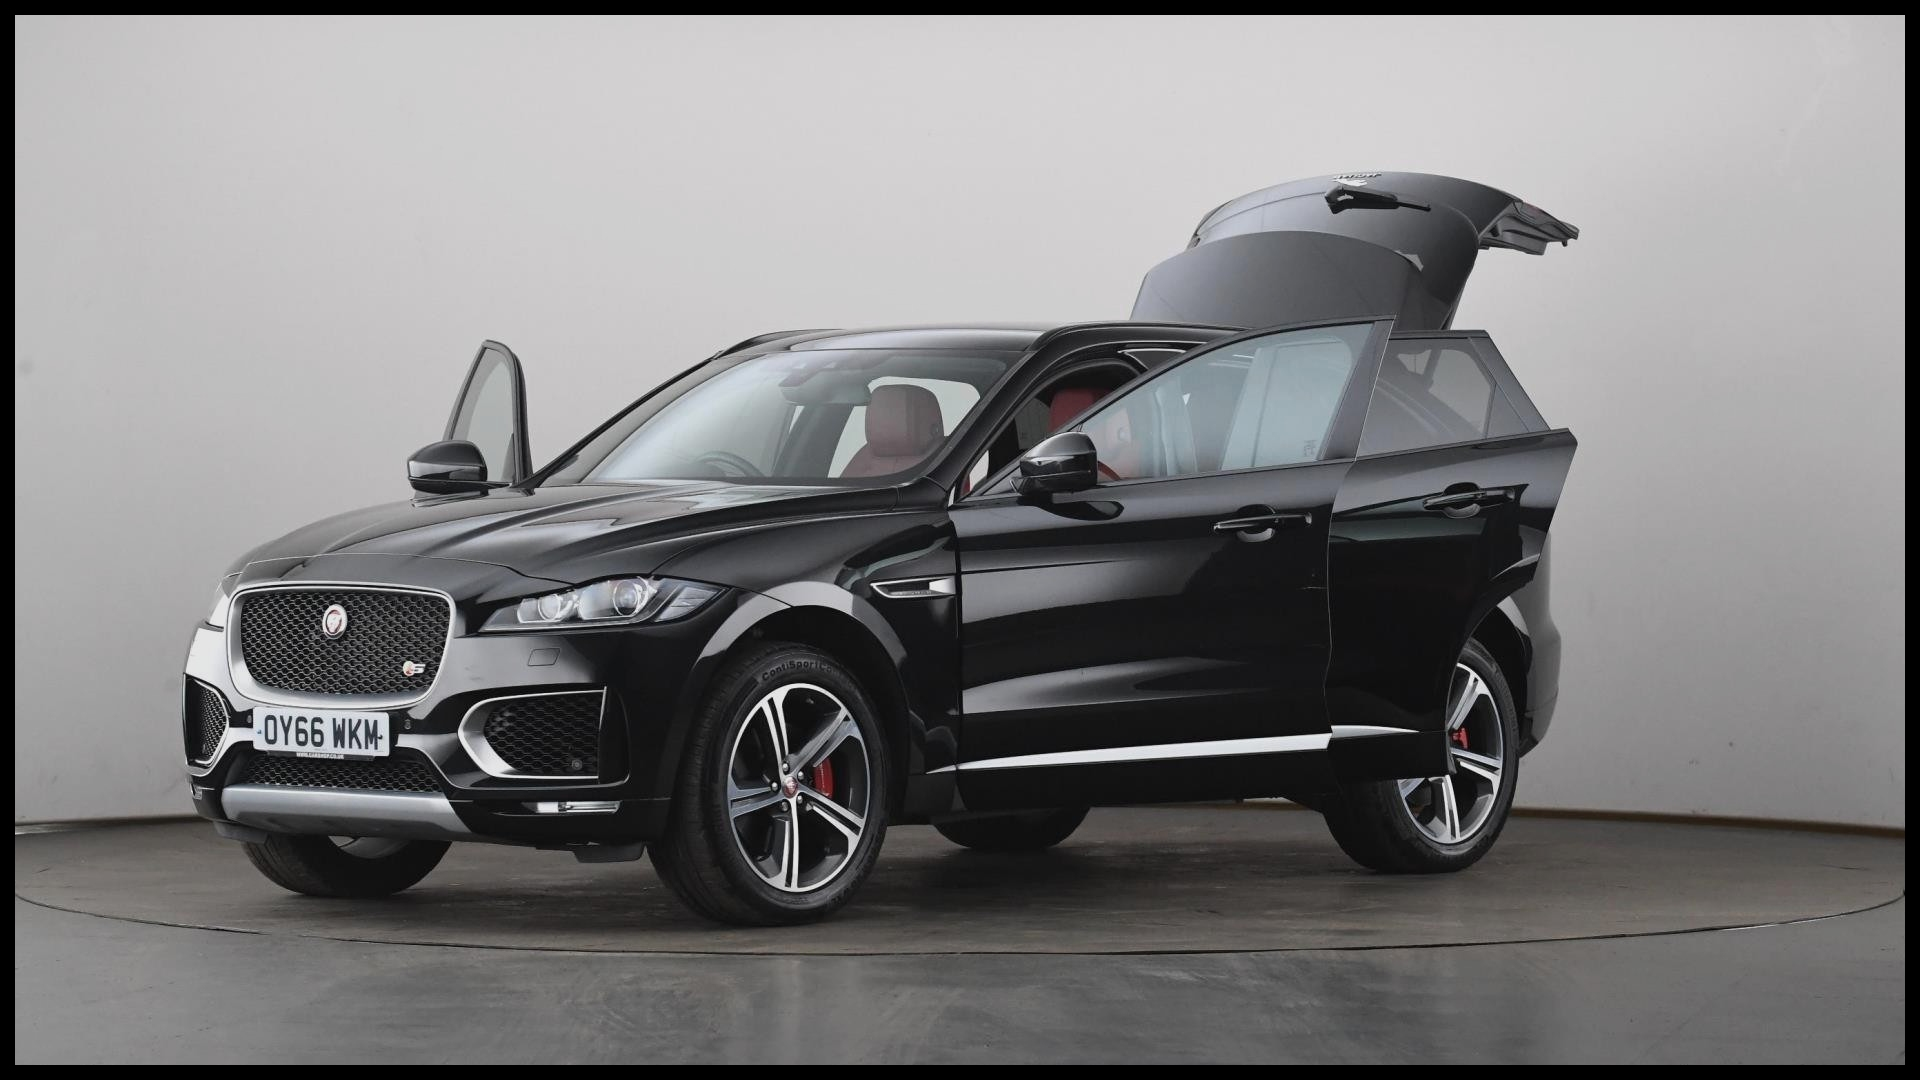 Used Cars Abq Best Nice Cars 2016 Beautiful Nice Black Cars S 2016 Infiniti Qx70